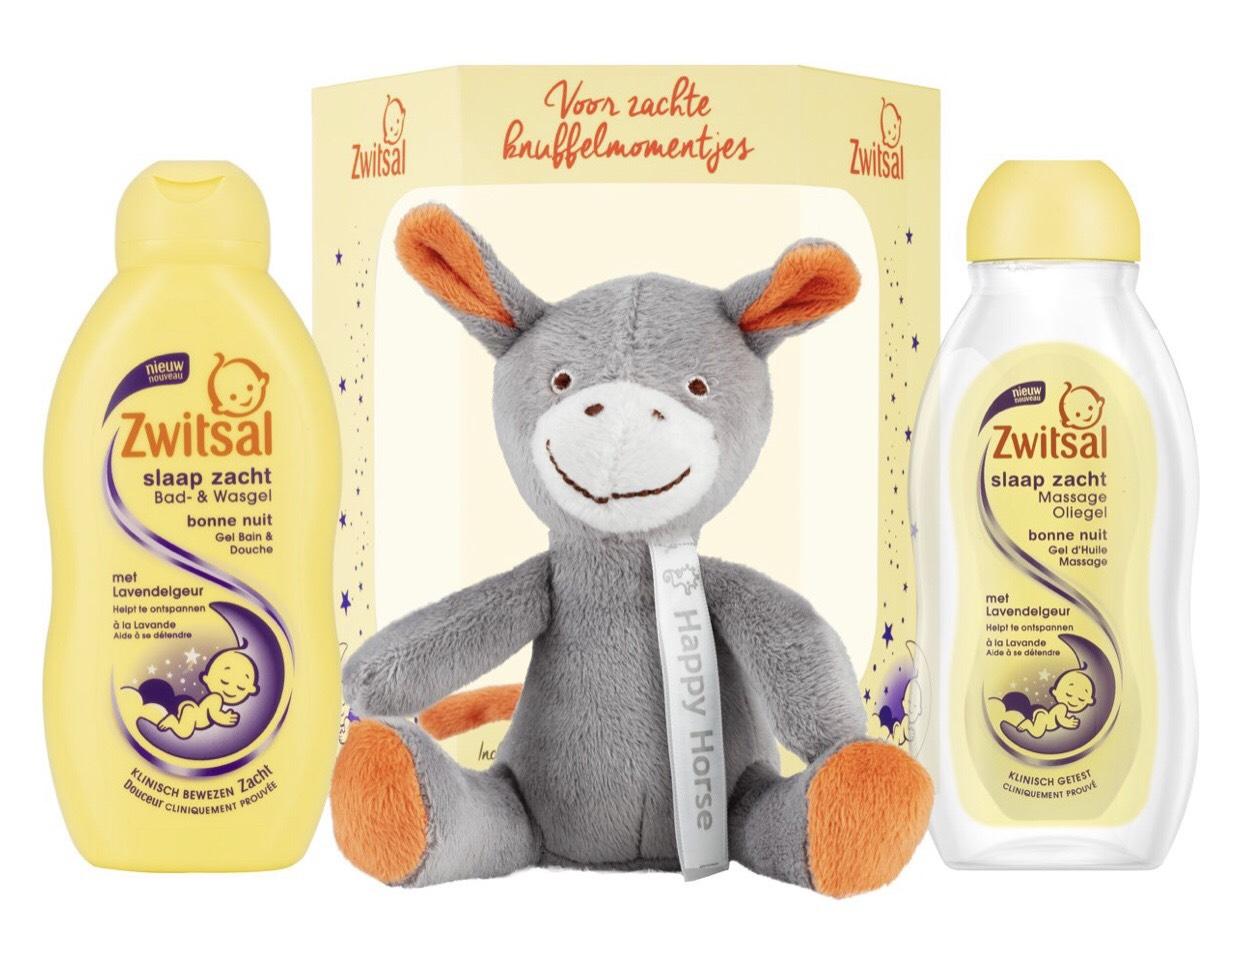 Zwitsal Happy Horse 3 delig cadeaupakket @ Bol.com